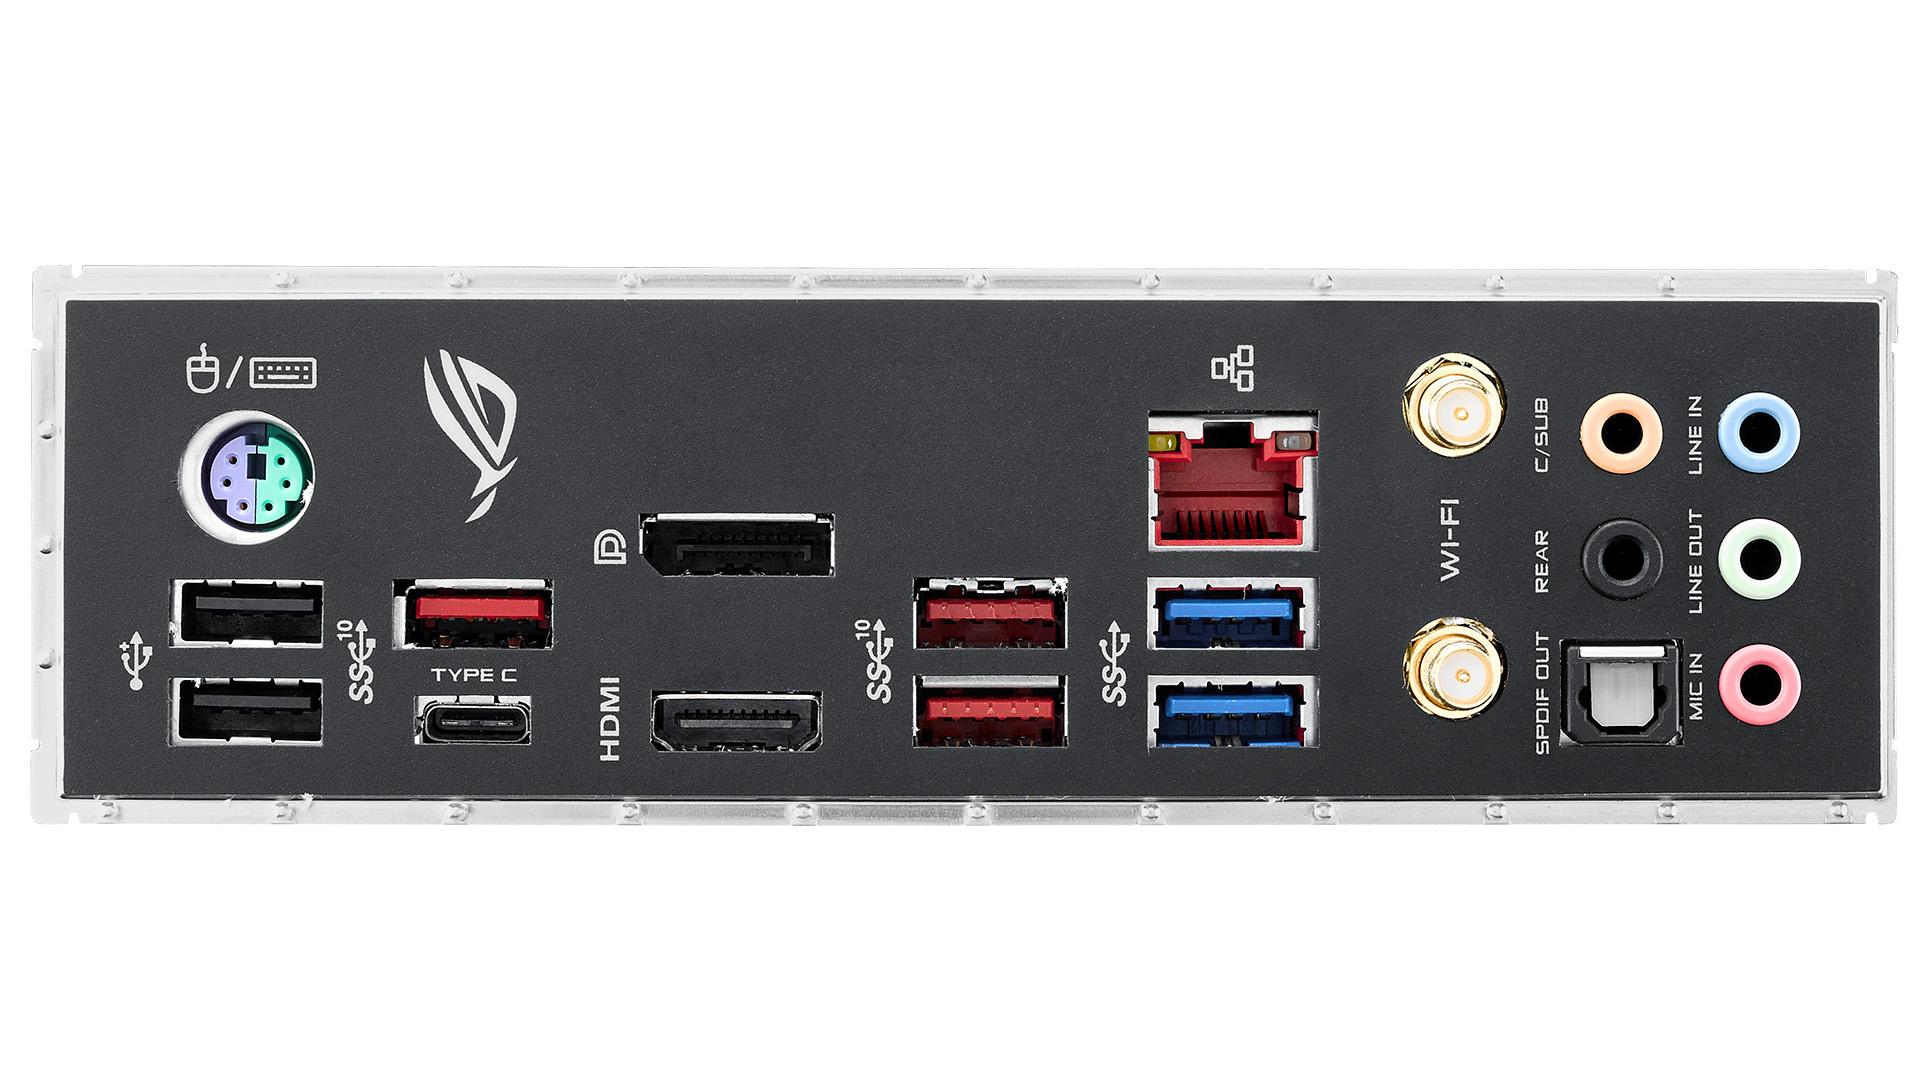 Asus Republic of Gamers STRIX Z390-E Gaming